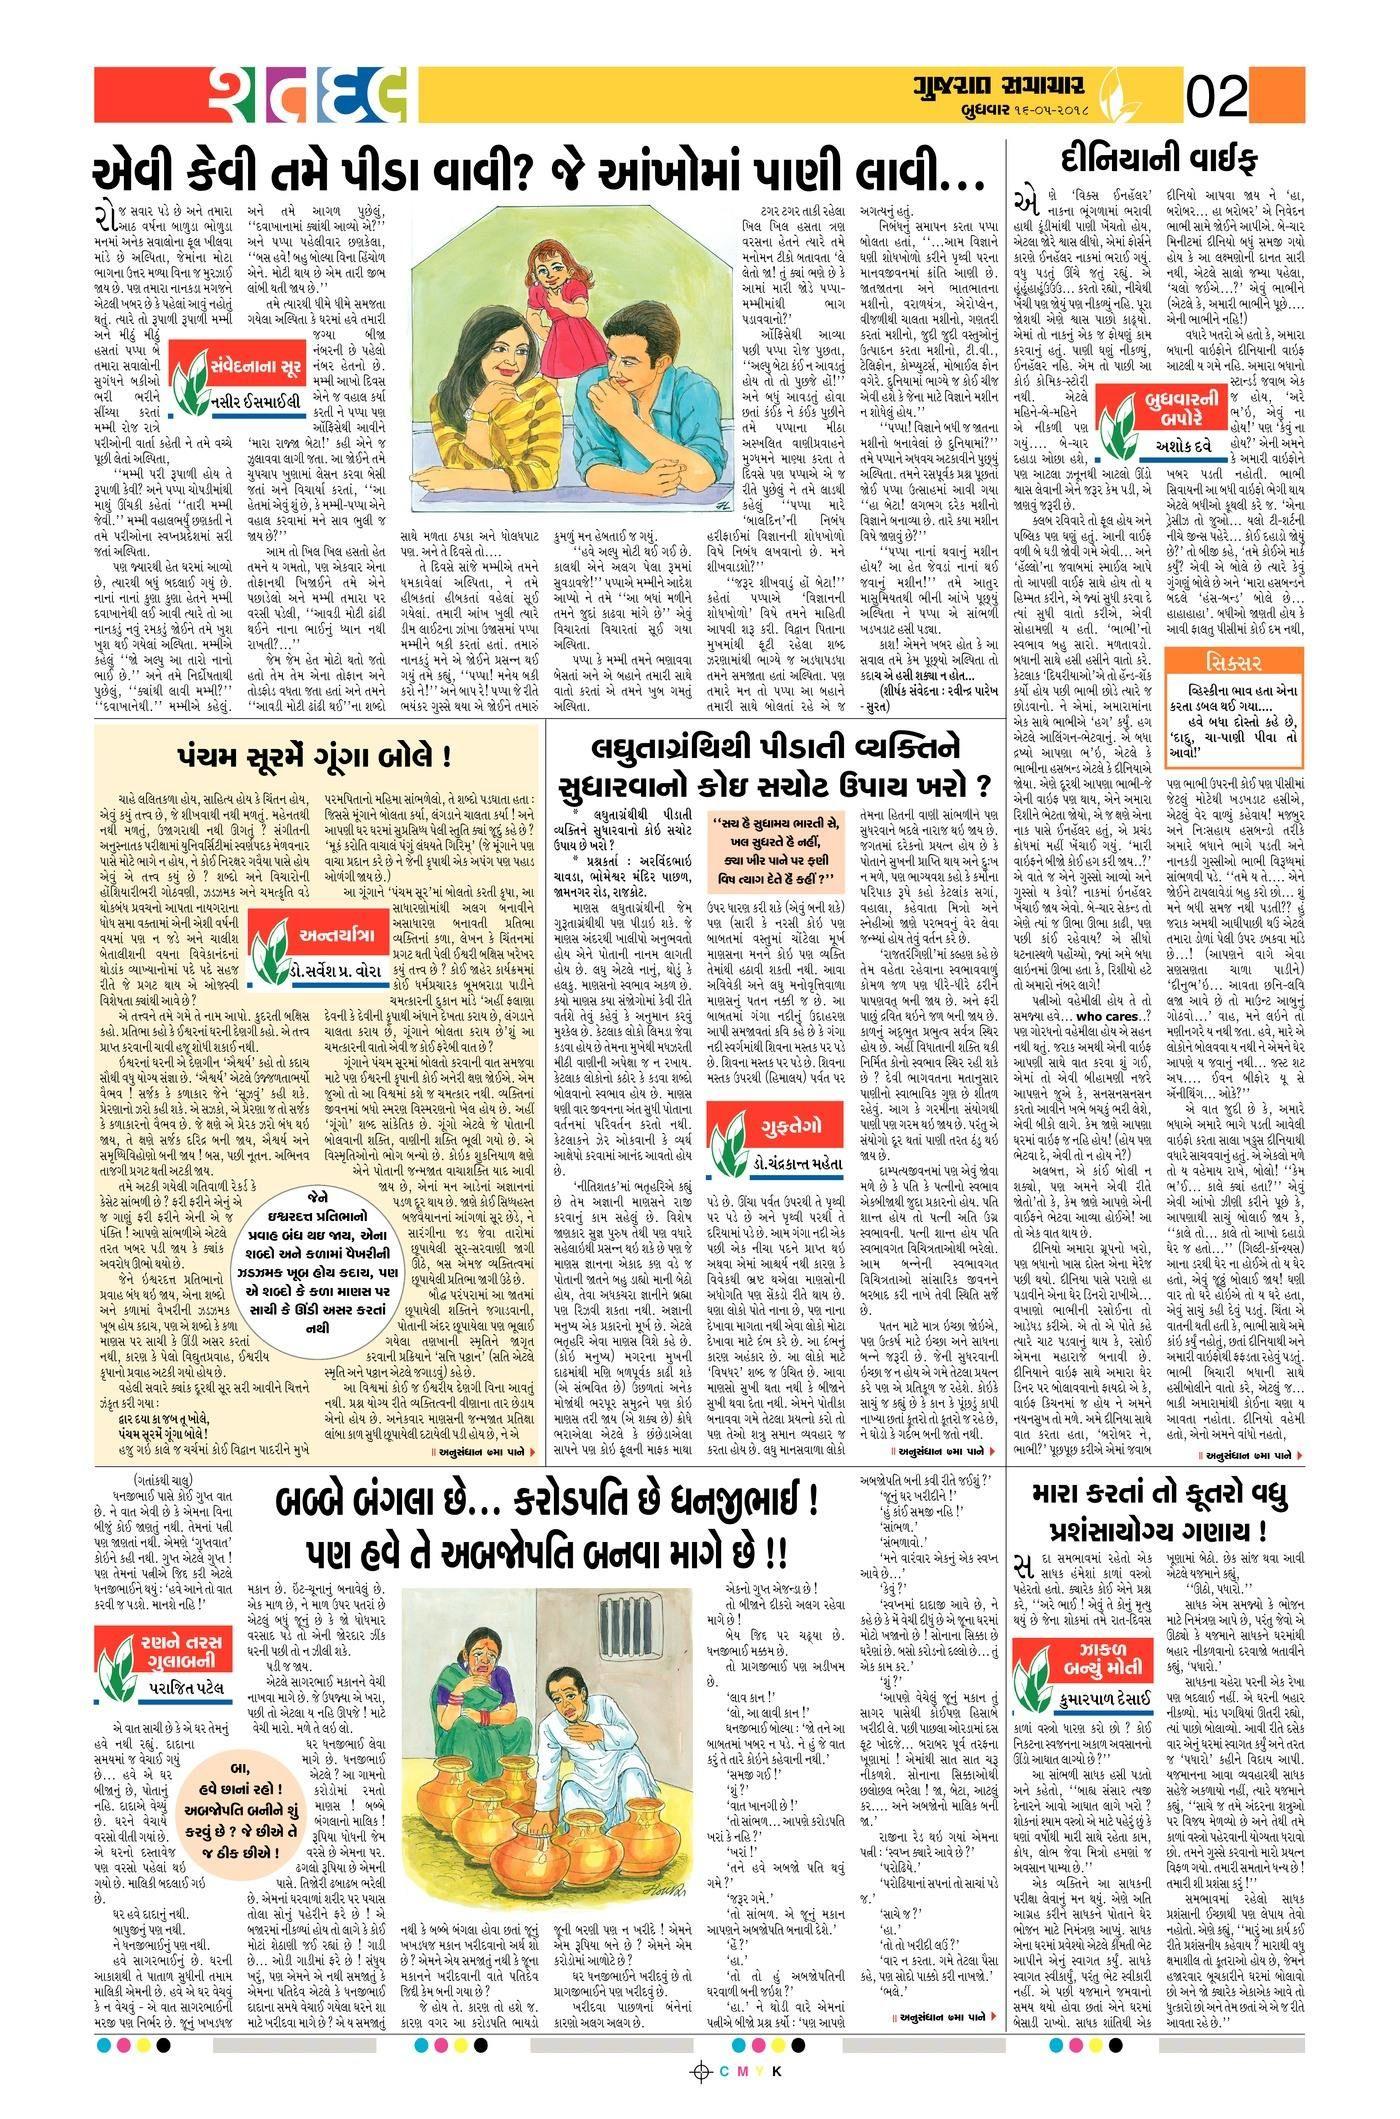 Gujarat Samachar Epaper Shatdal Edition   Icse   Bullet Journal - Printable Gujarati Crossword Puzzles